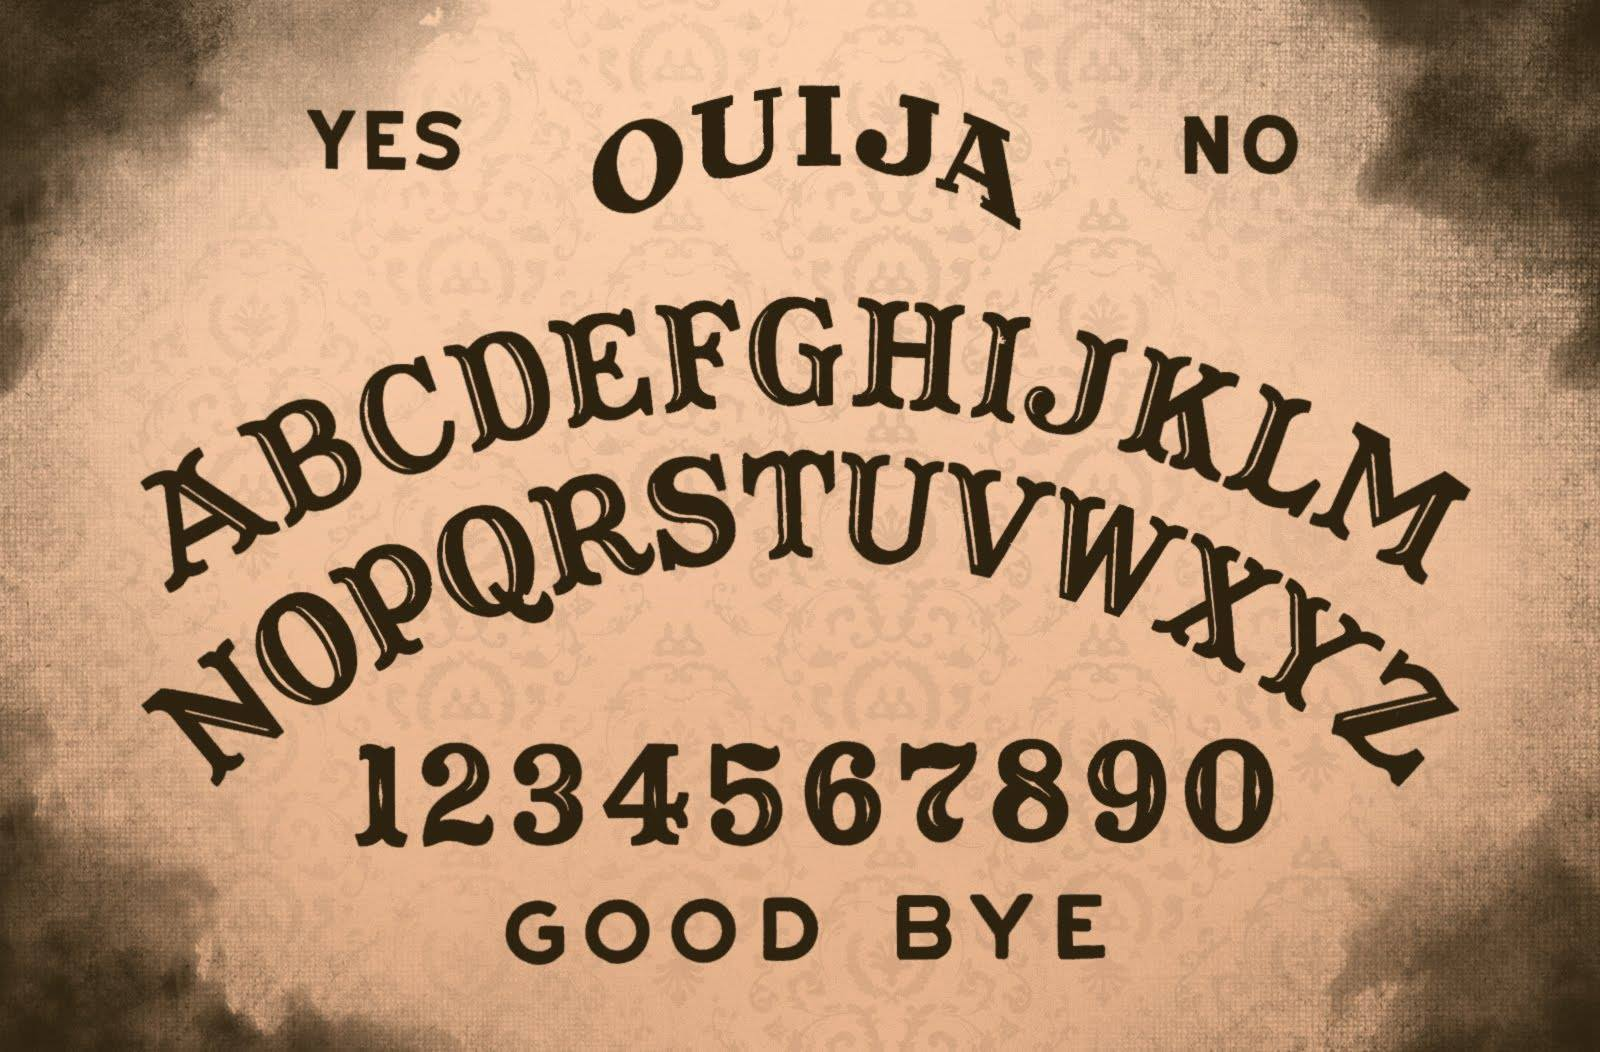 Pericoli della tavola ouija: apre la porta ai demoni